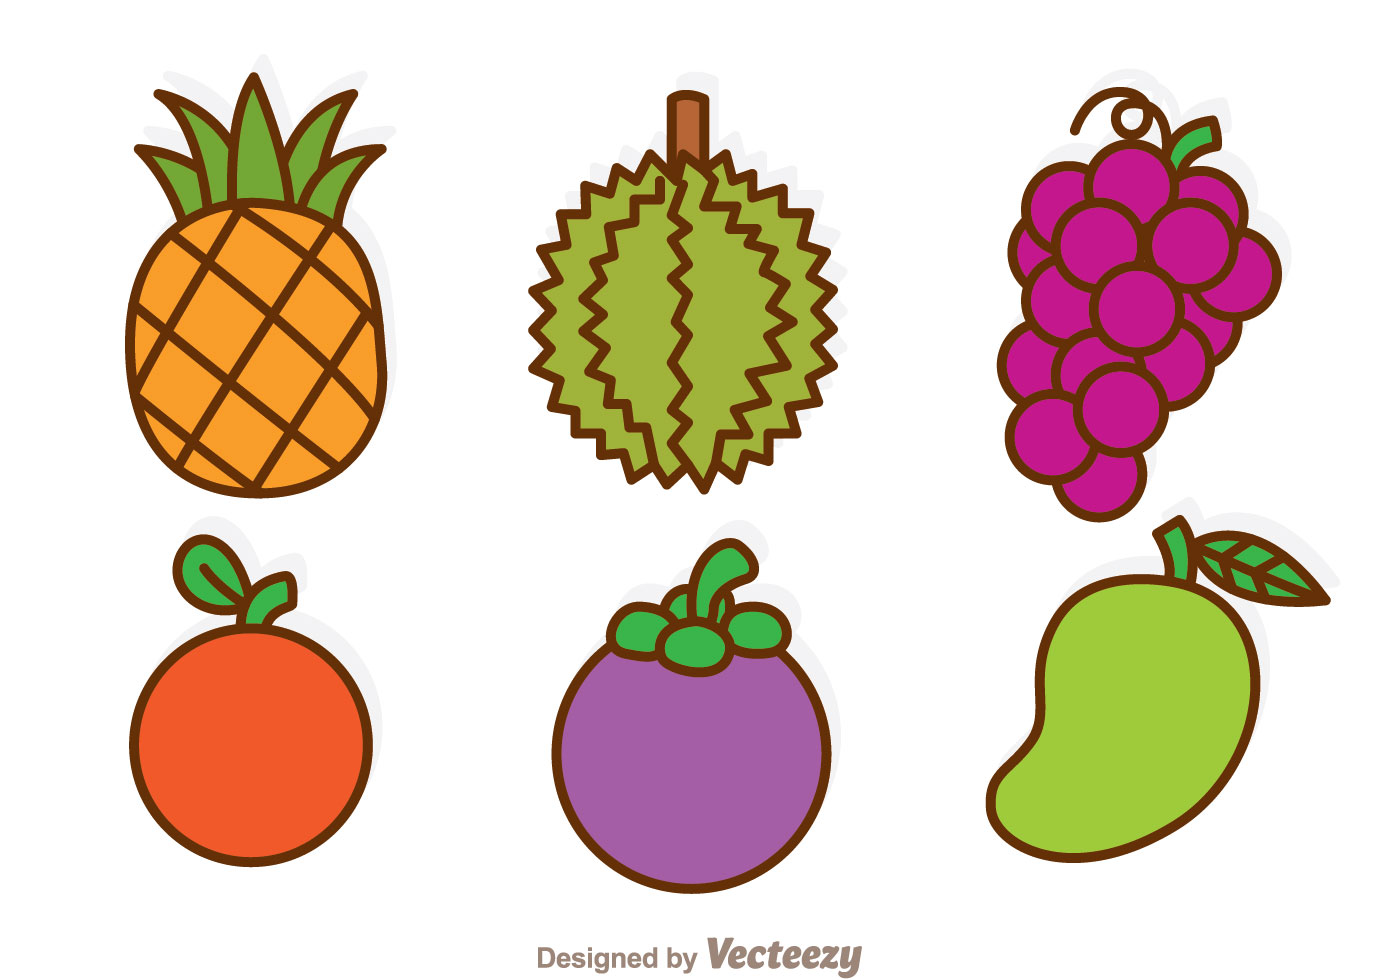 fruits cartoon icons download free vector art stock graphics